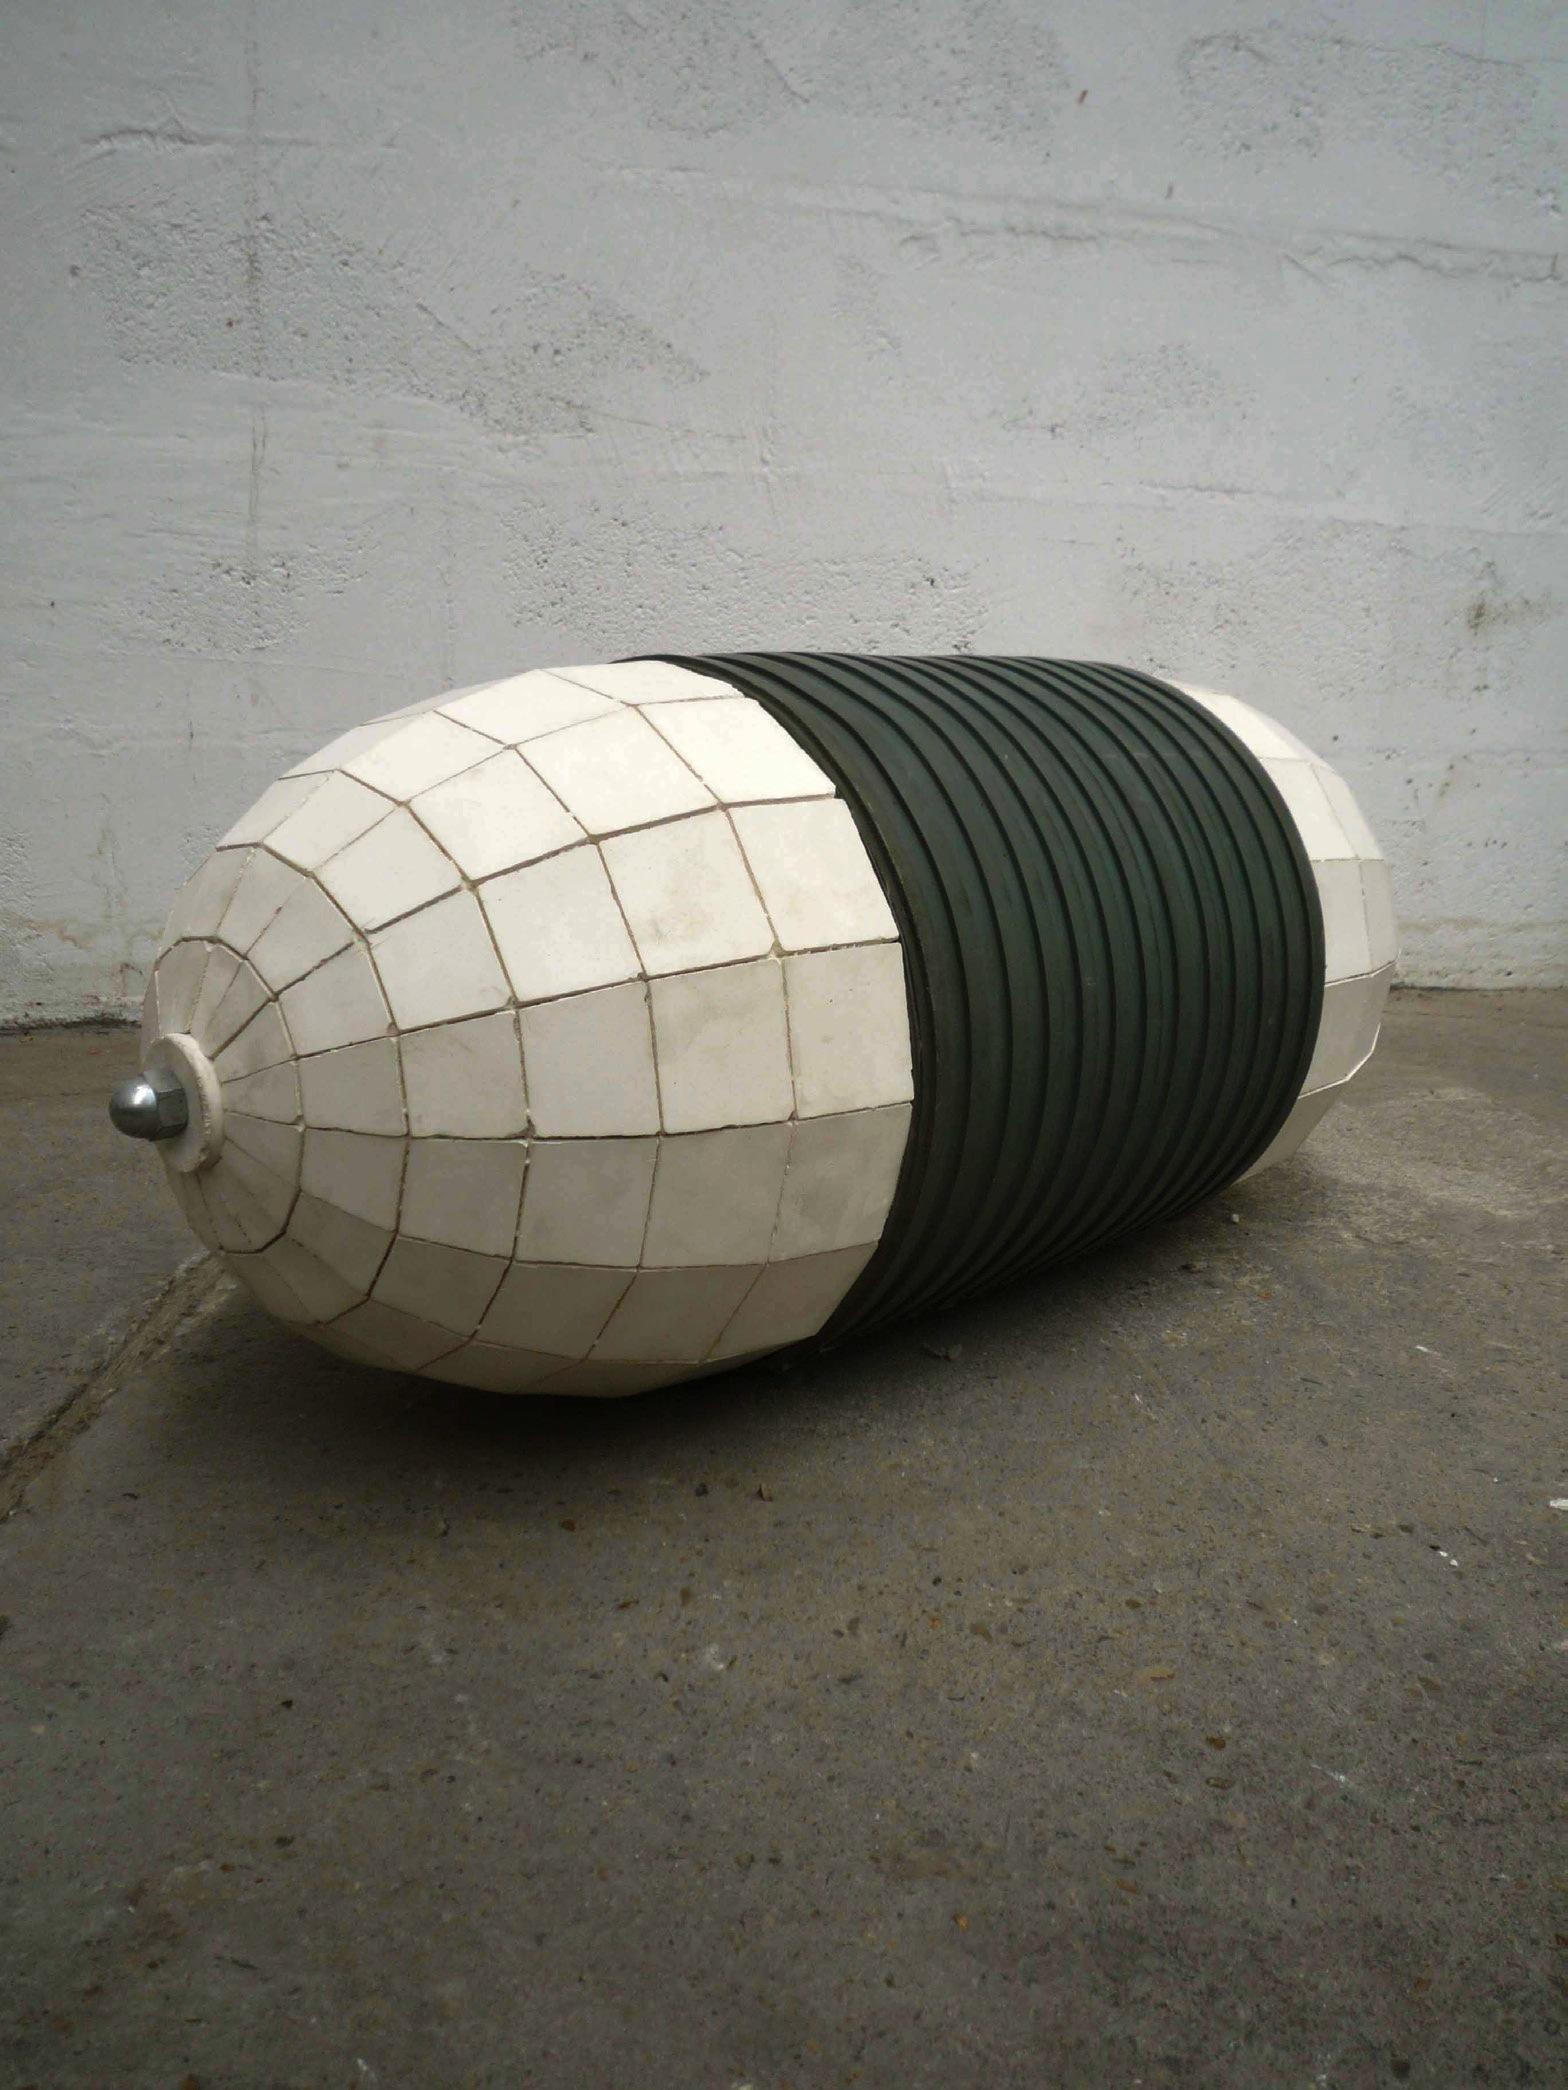 Felix pinquier echo 2012 galerie marine veilleux original